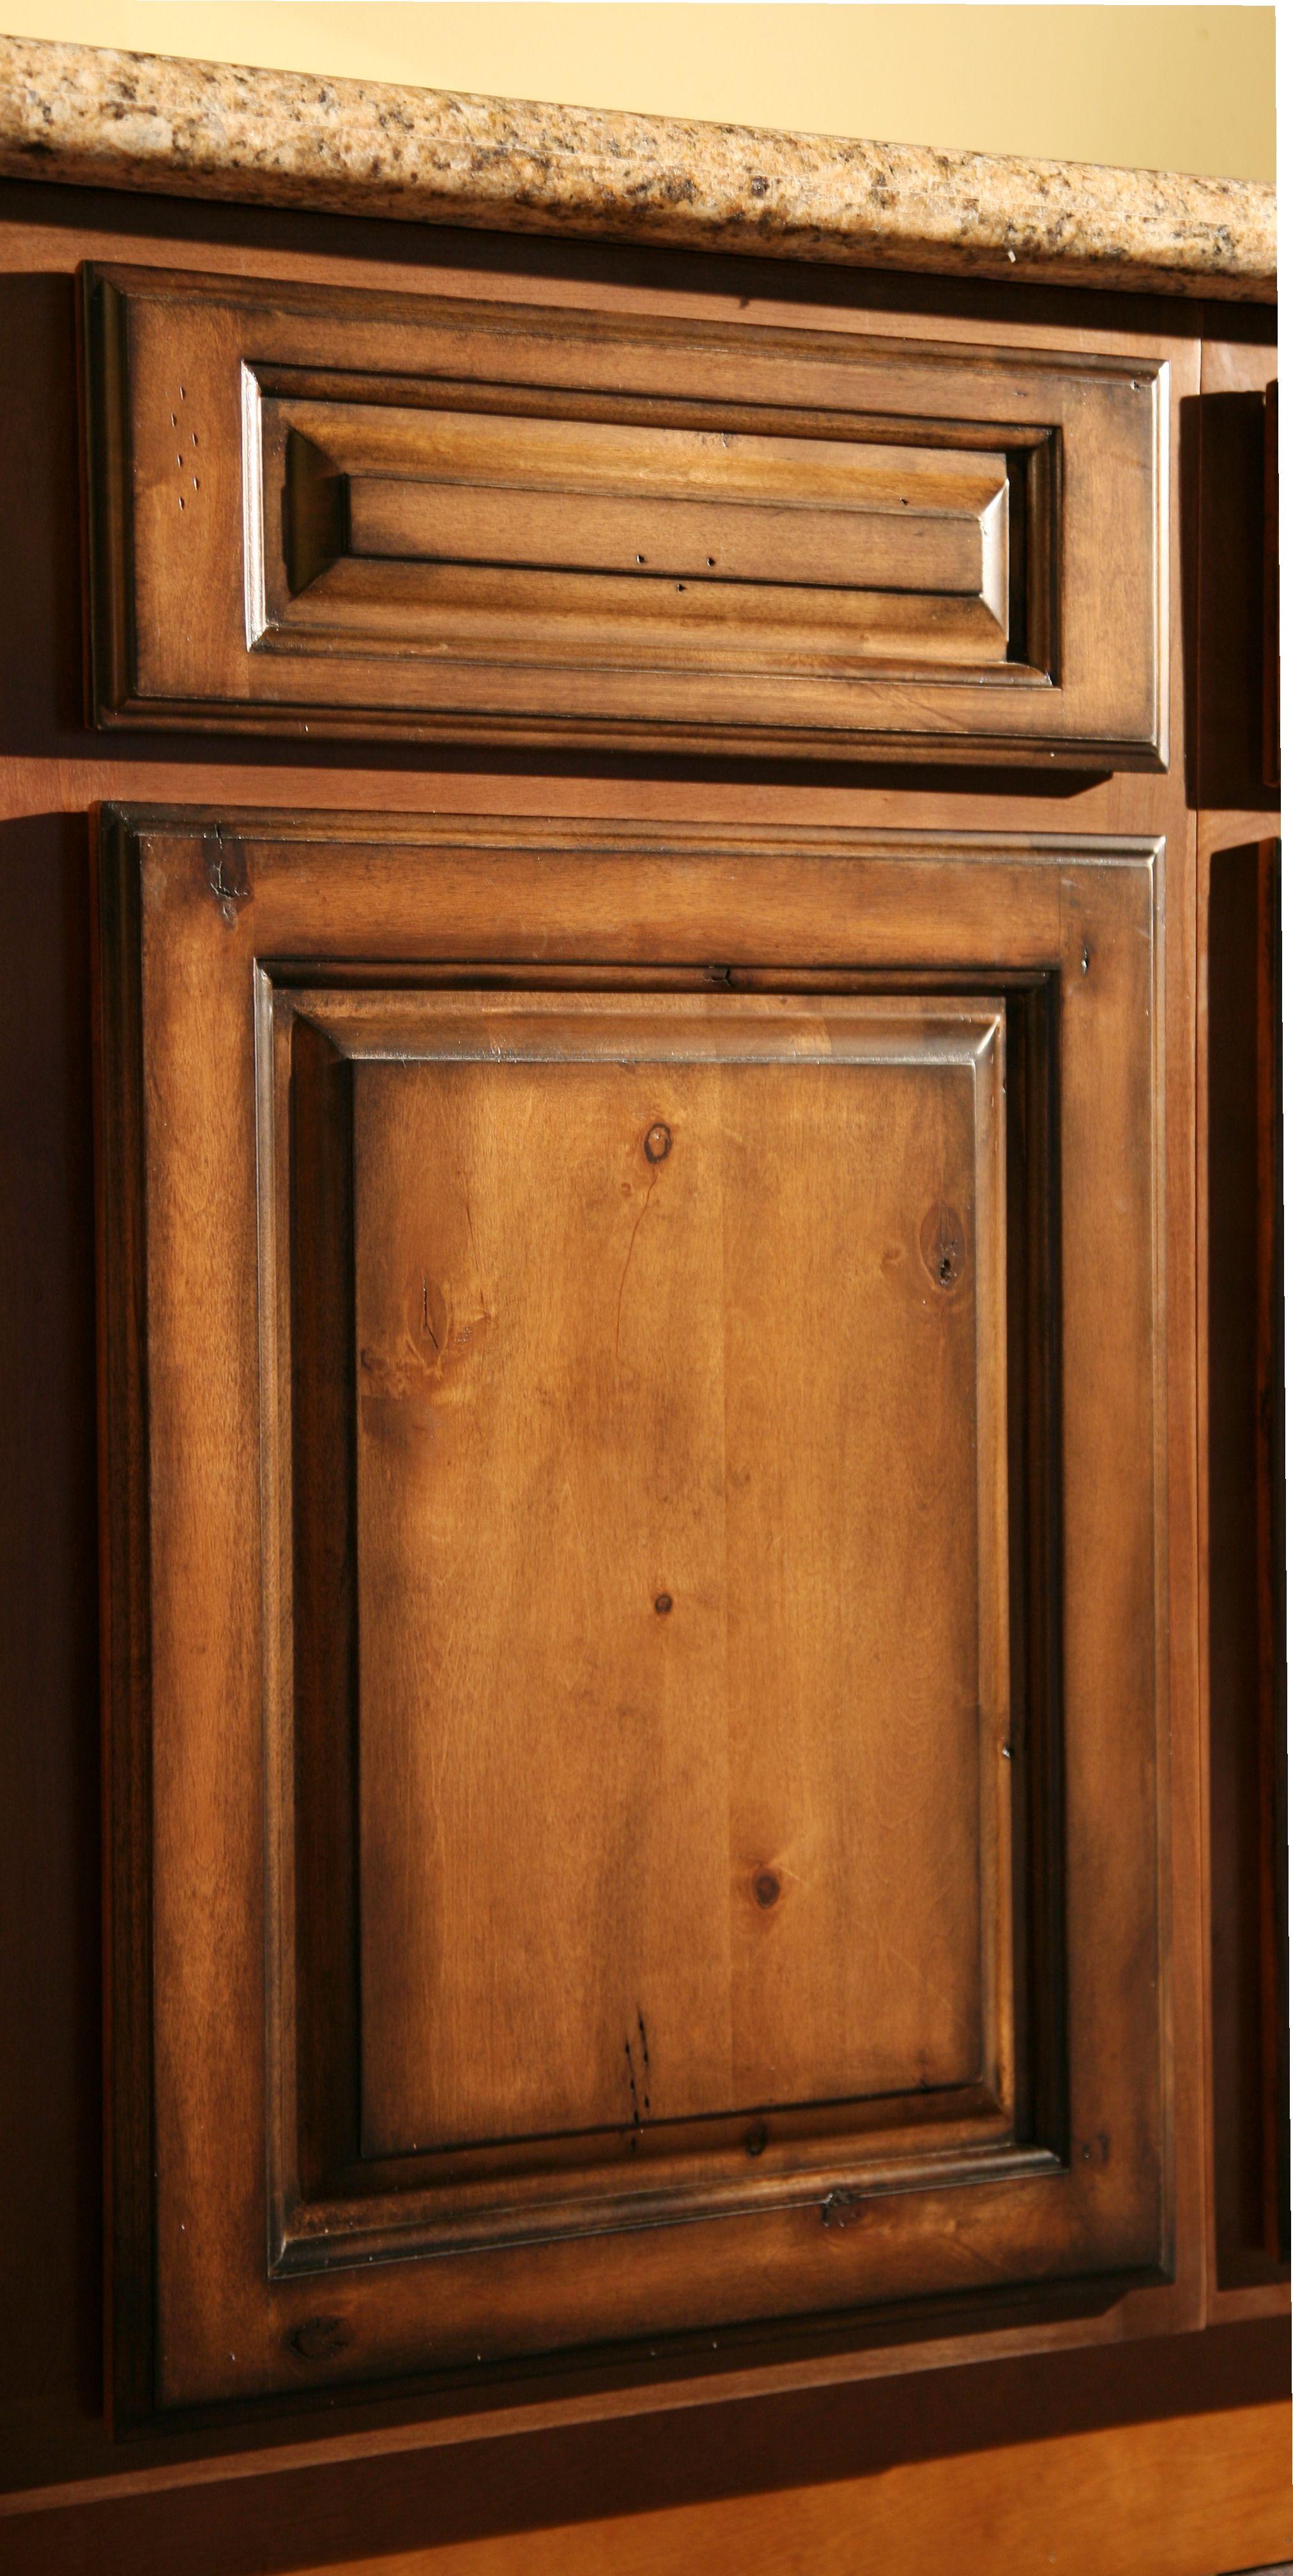 rustic kitchen cabinets Pecan Maple Glaze Kitchen Cabinets Rustic Finish Sample Door RTA All wood